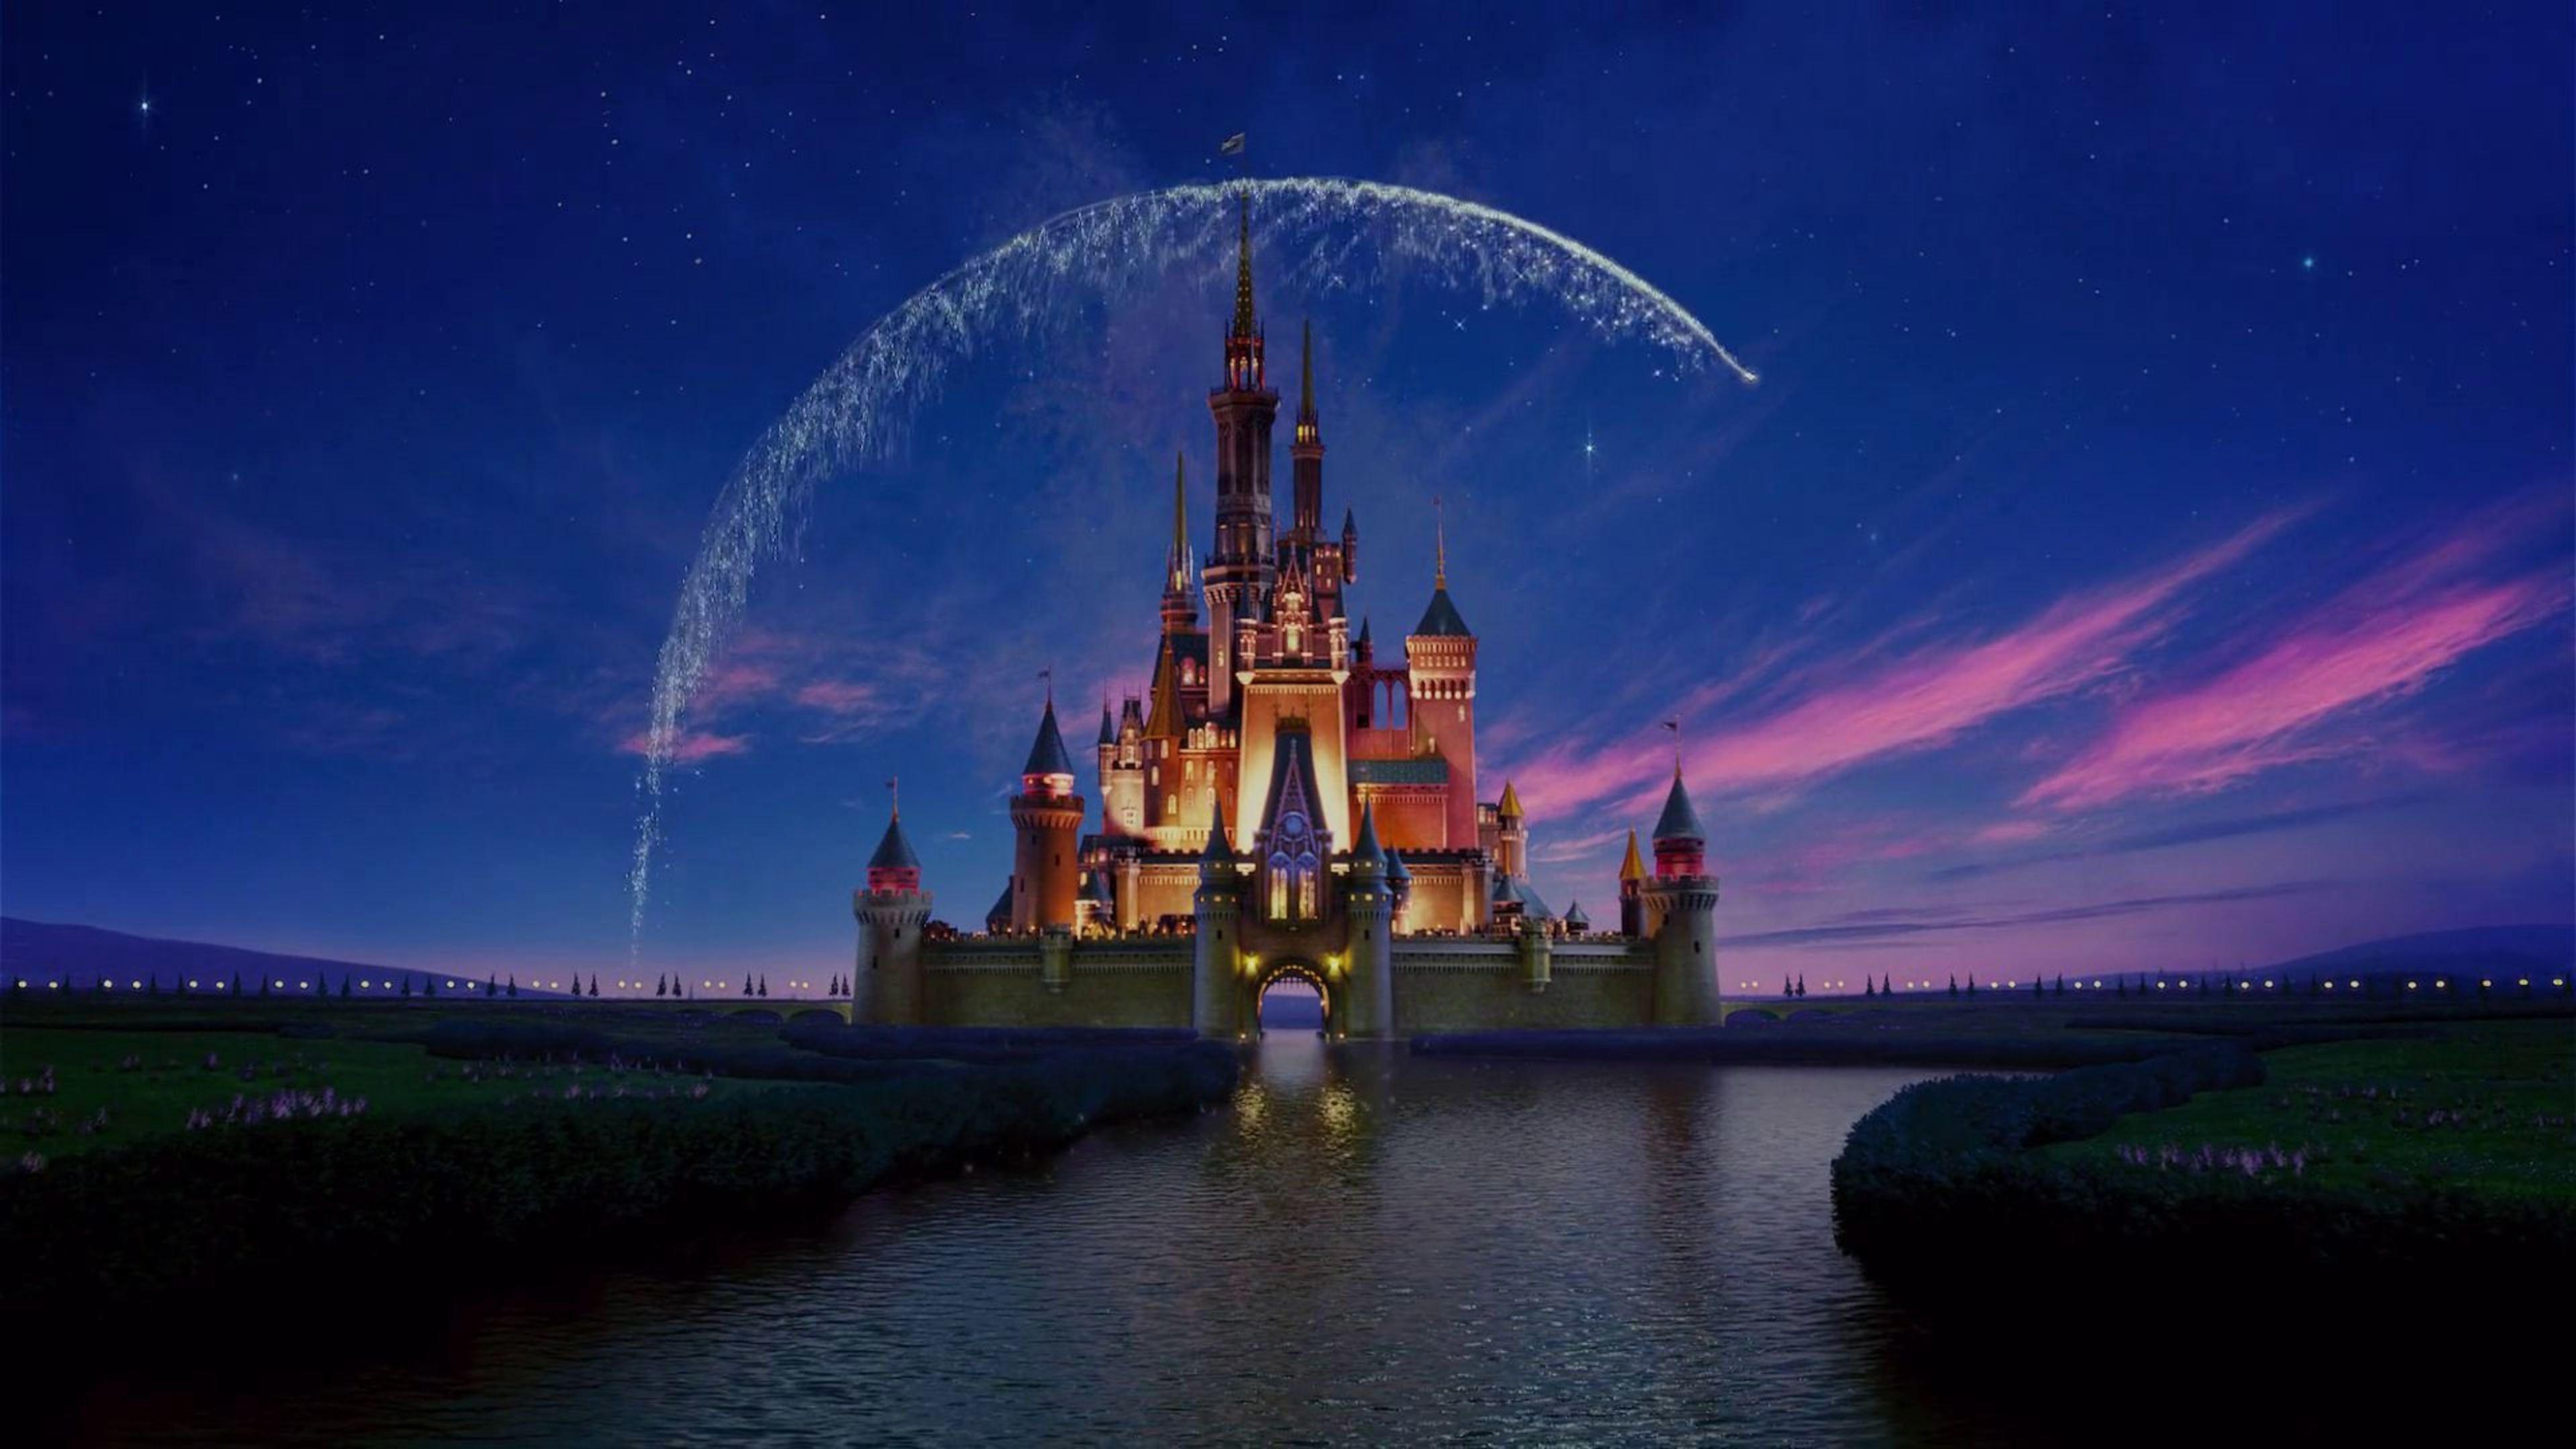 Disney Computer Wallpapers Top Free Disney Computer Backgrounds Wallpaperaccess